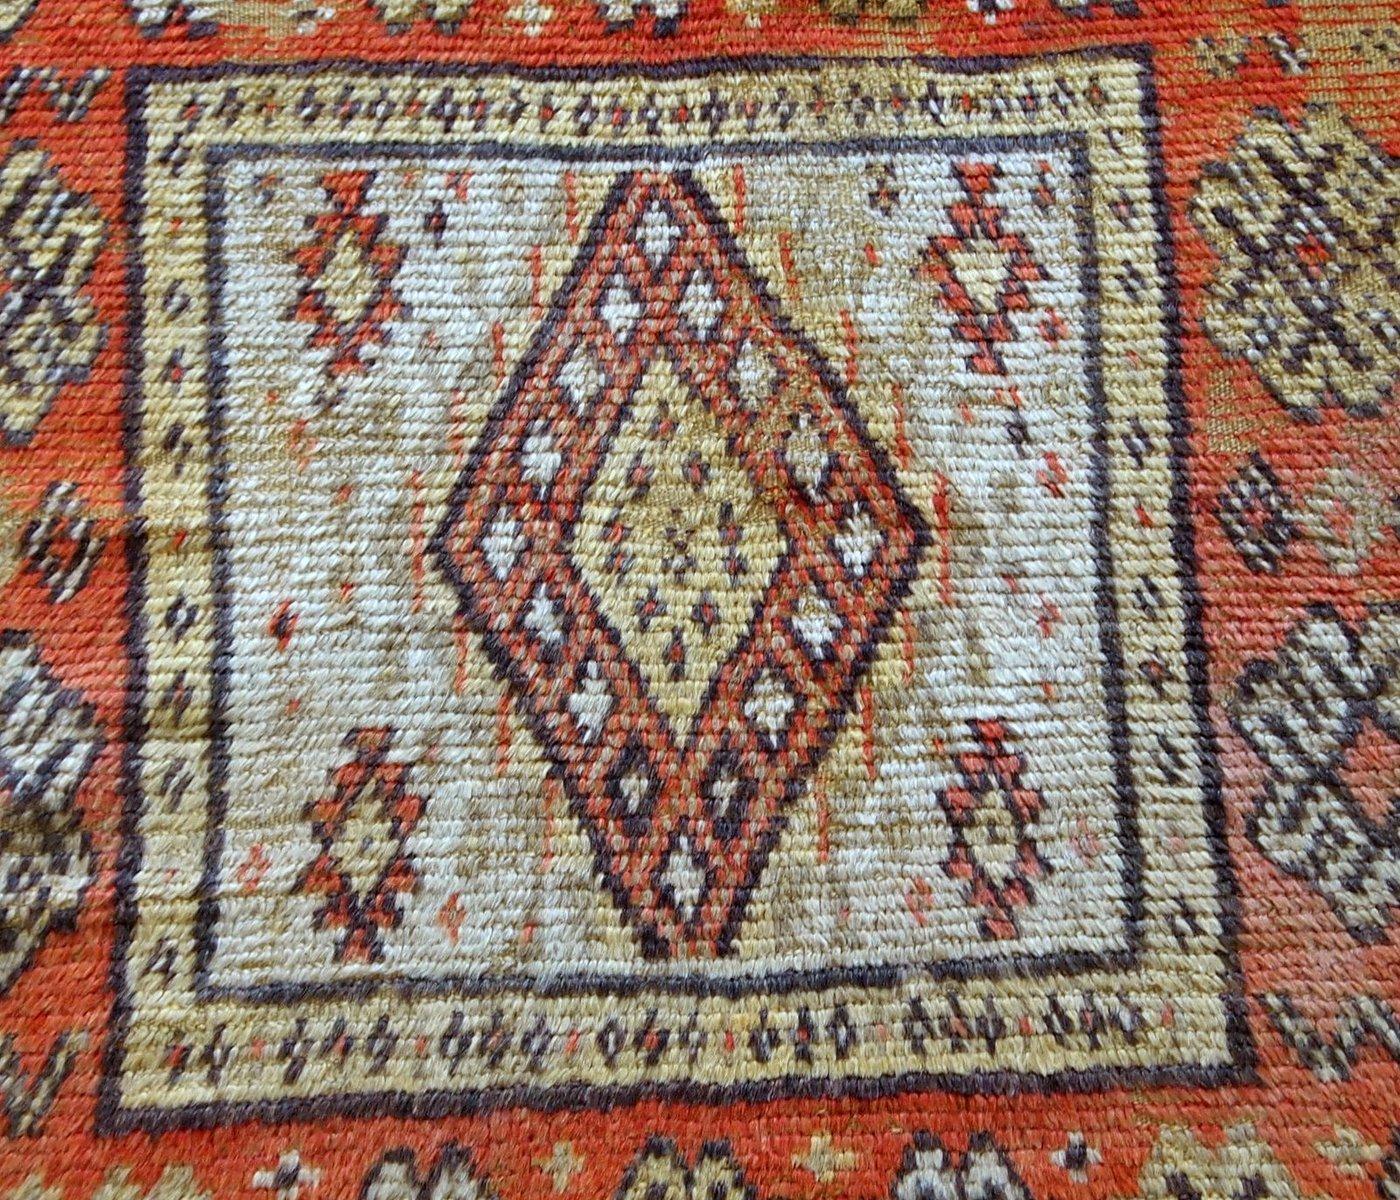 Moroccan Handmade Berber Rug, 1900s For Sale At Pamono